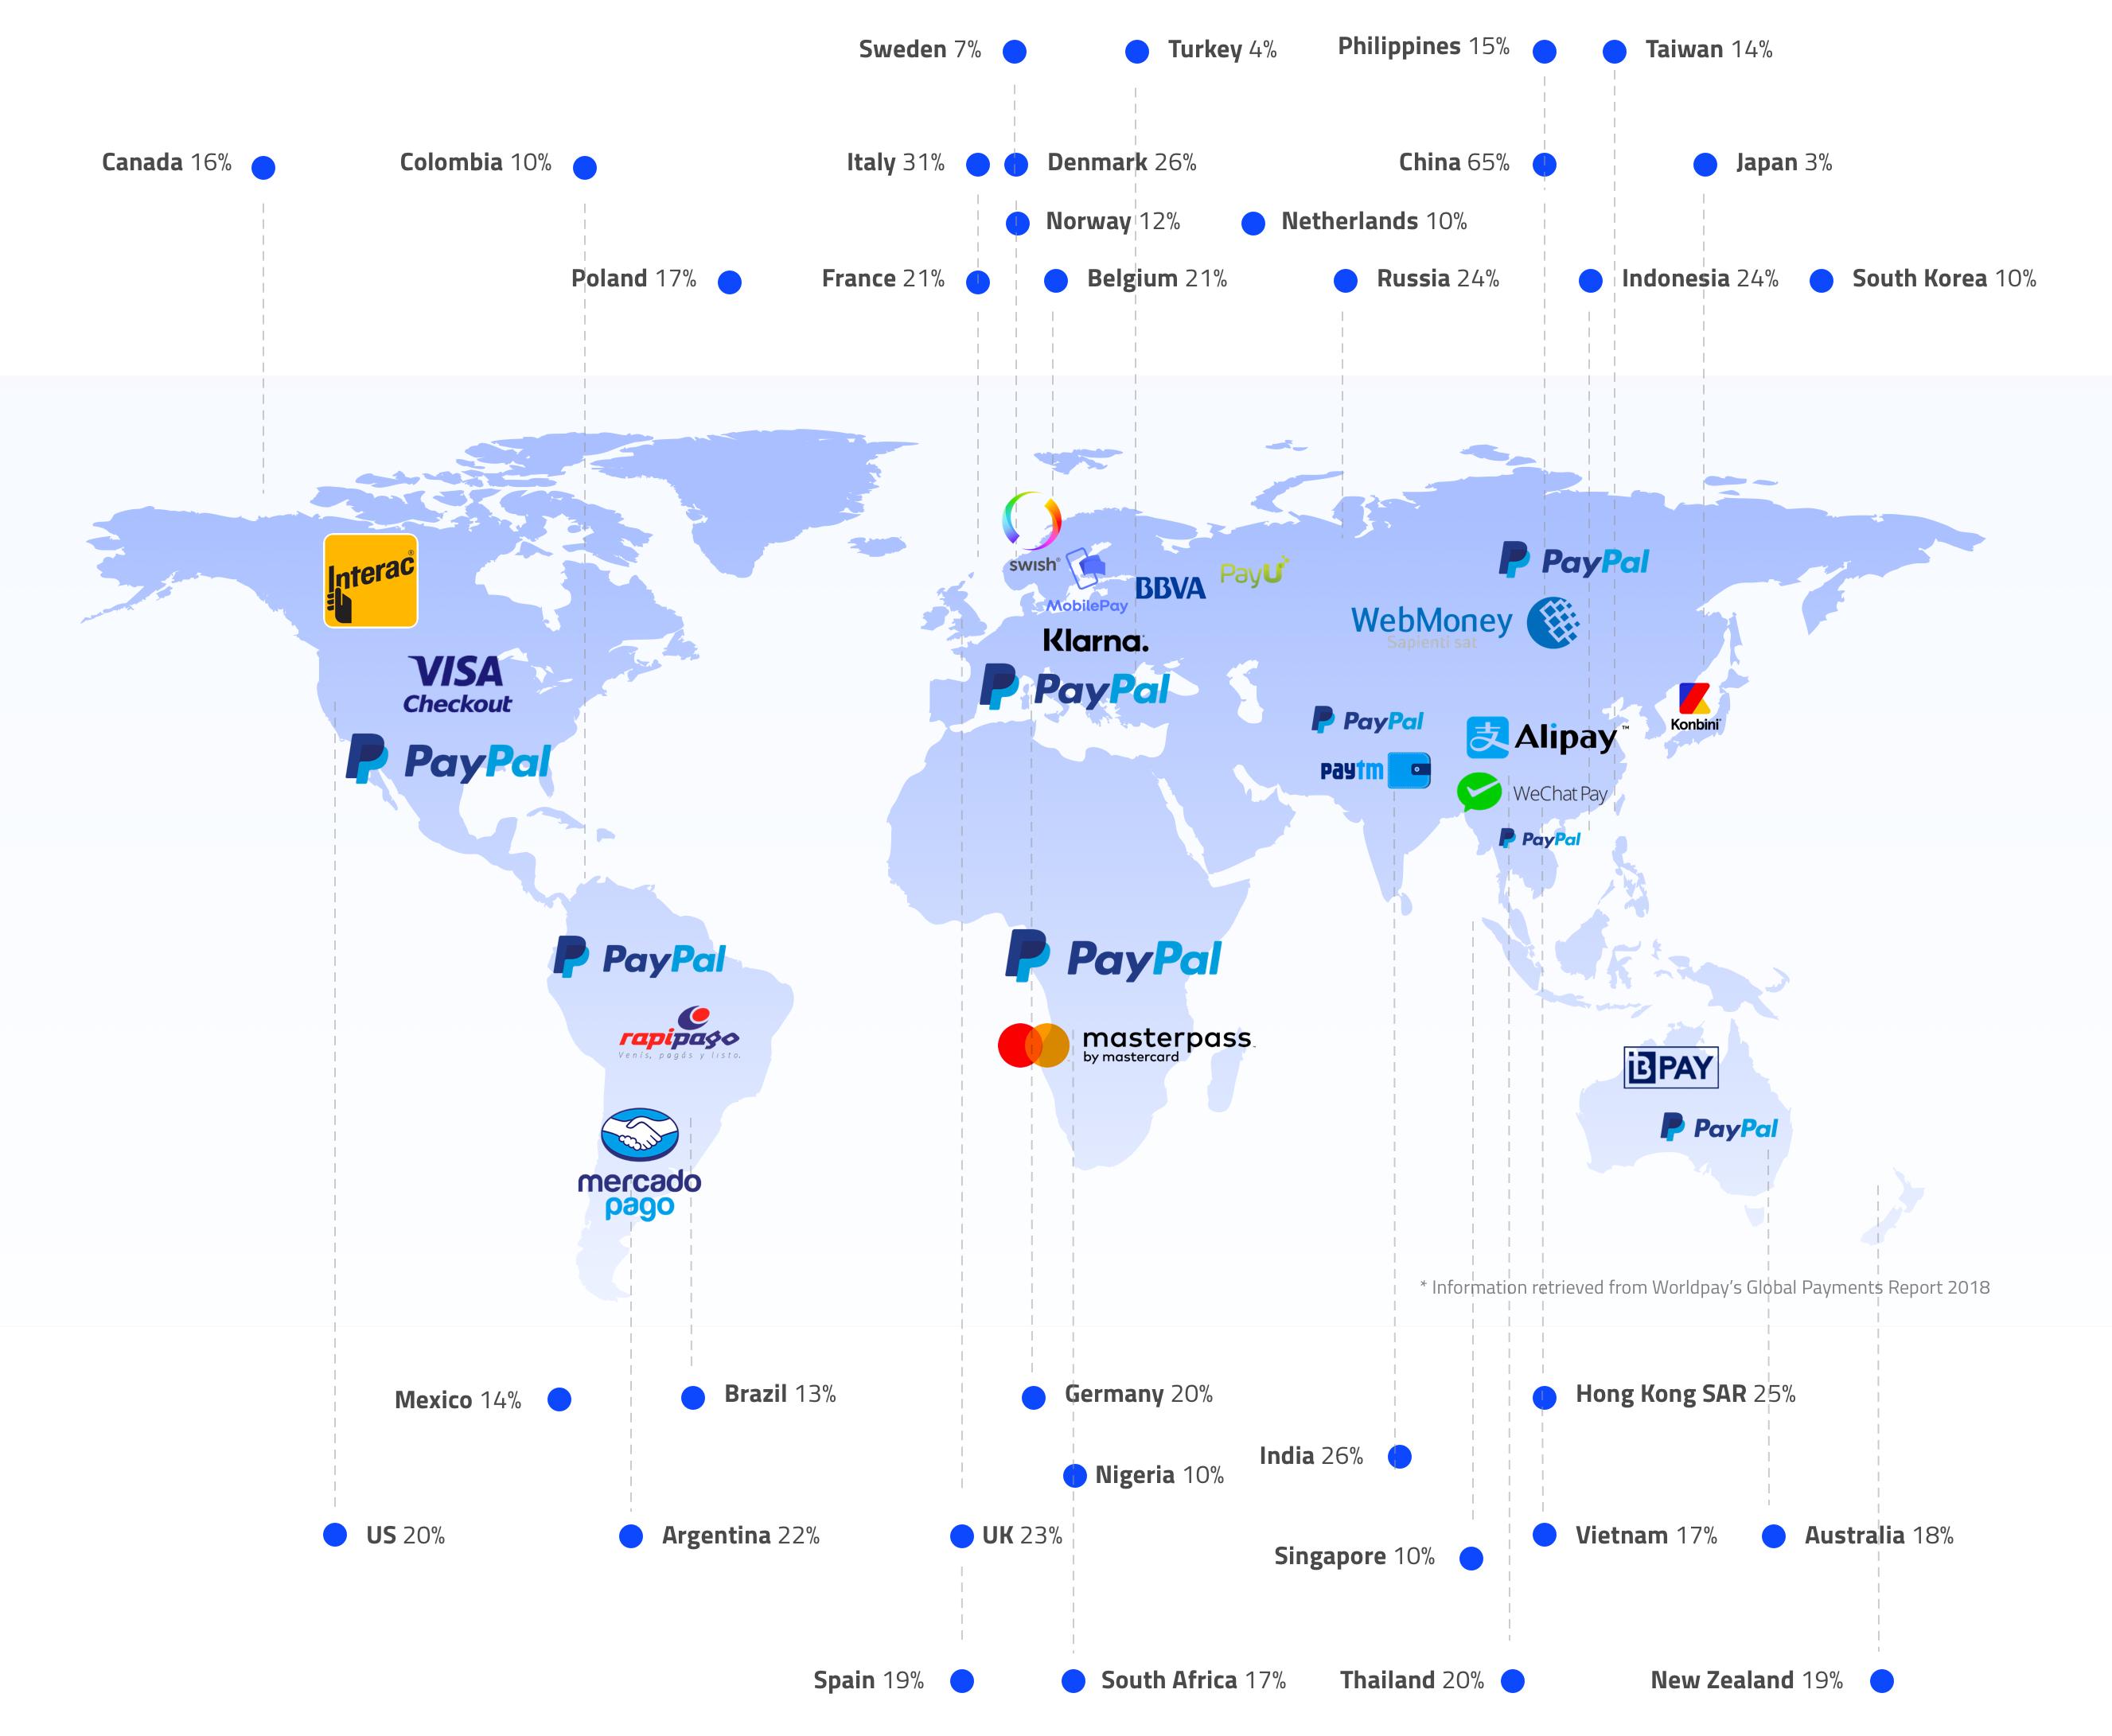 eWallet Usage Globally